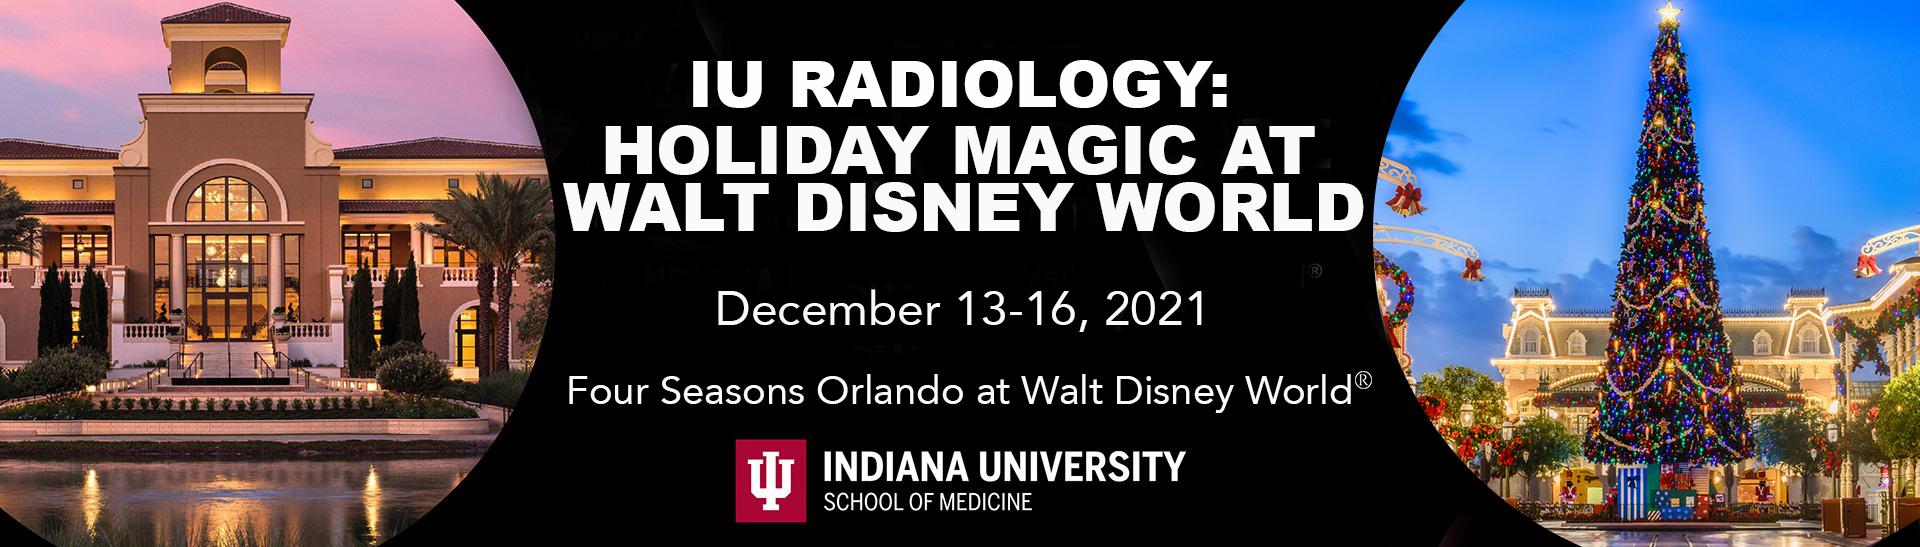 IU Radiology- Holiday Magic at Walt Disney World 2021